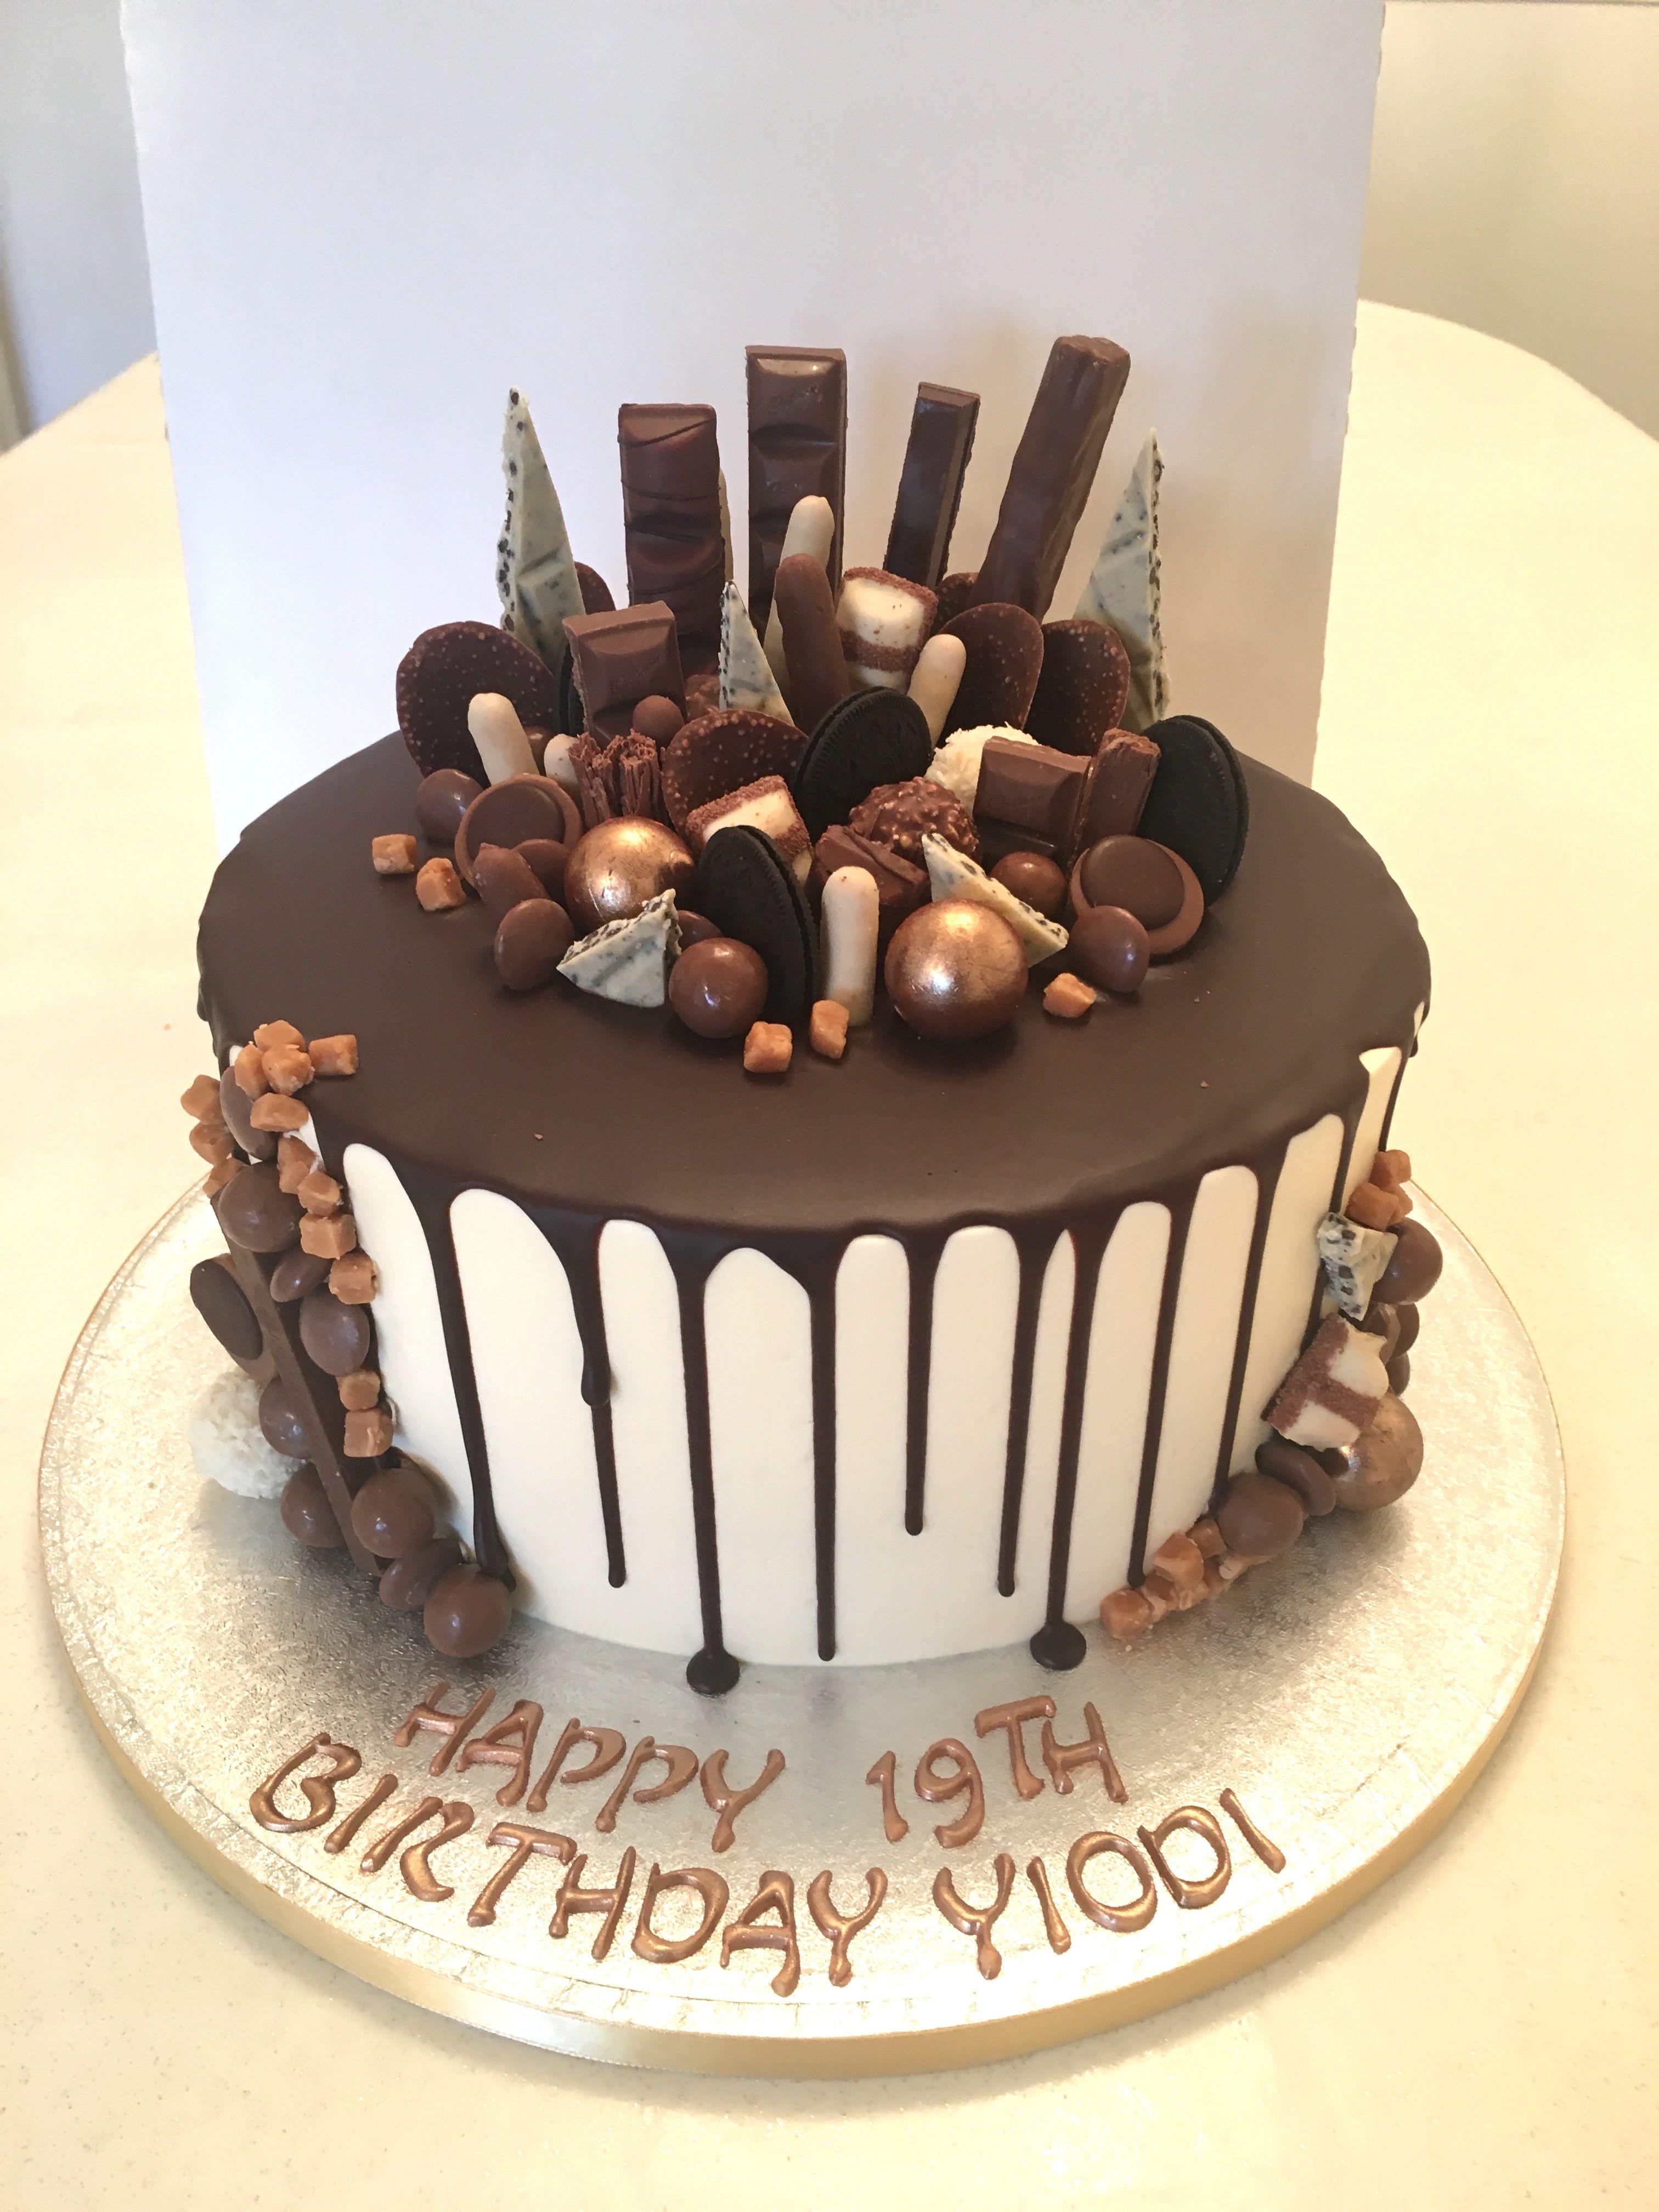 Dogum Gunu Pastasi Chocolate Cake Designs Birthday Cake